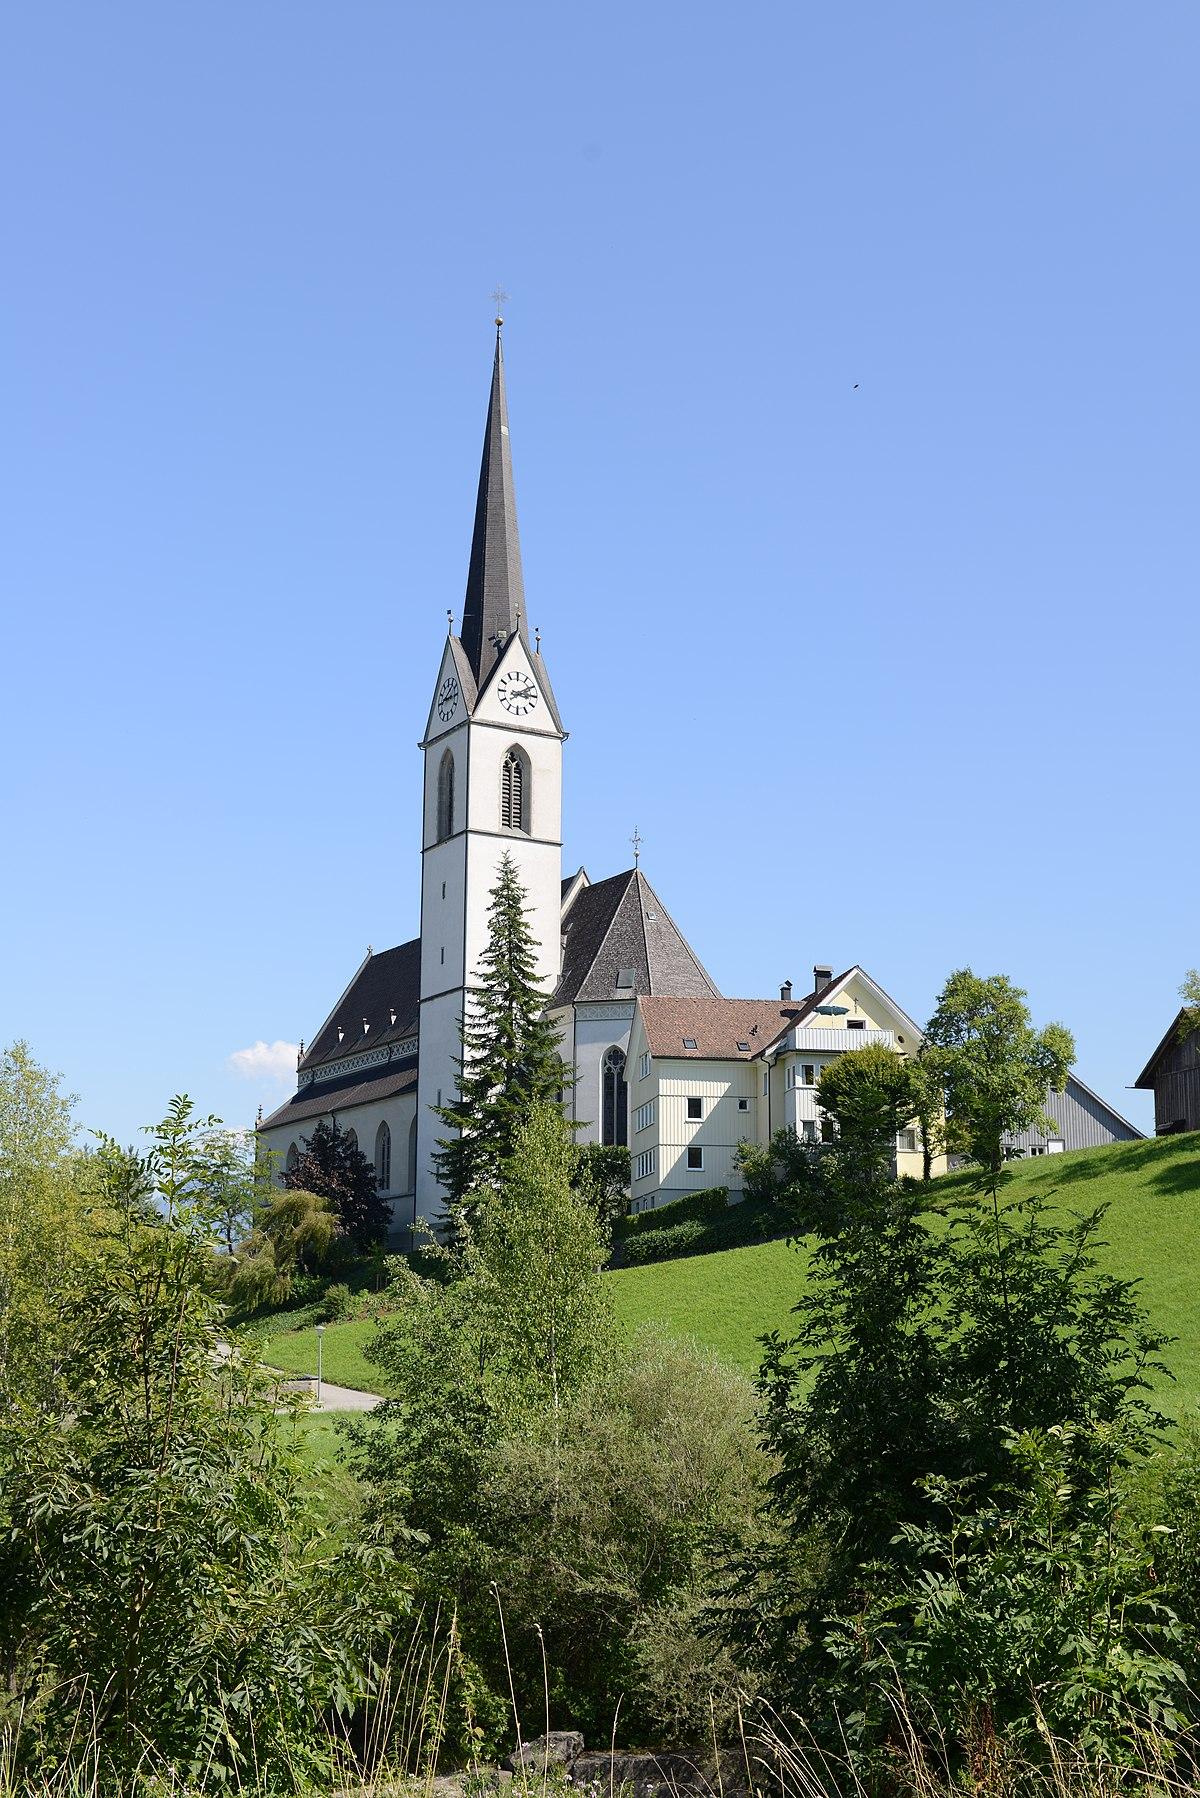 Swiss Dating Free Frastanz - Webrocket